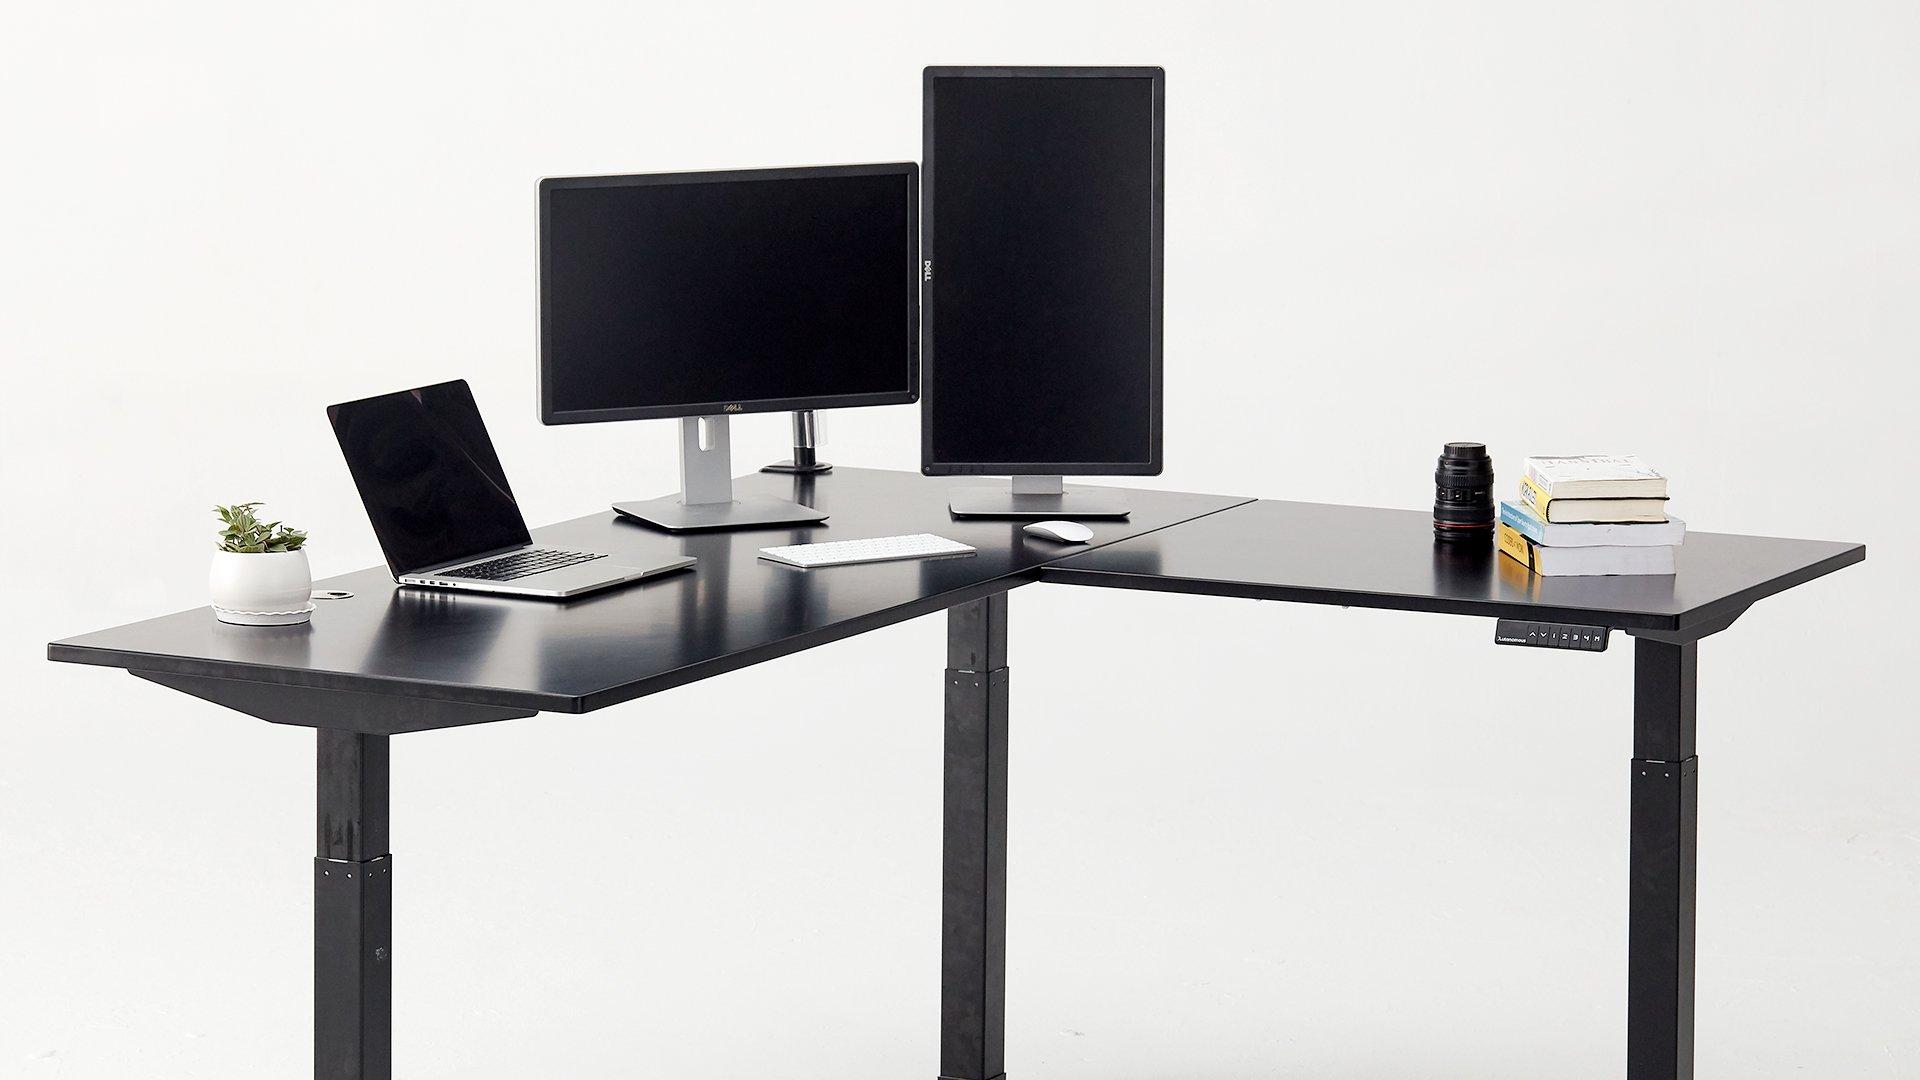 Multi-Monitor L-Shaped Desk